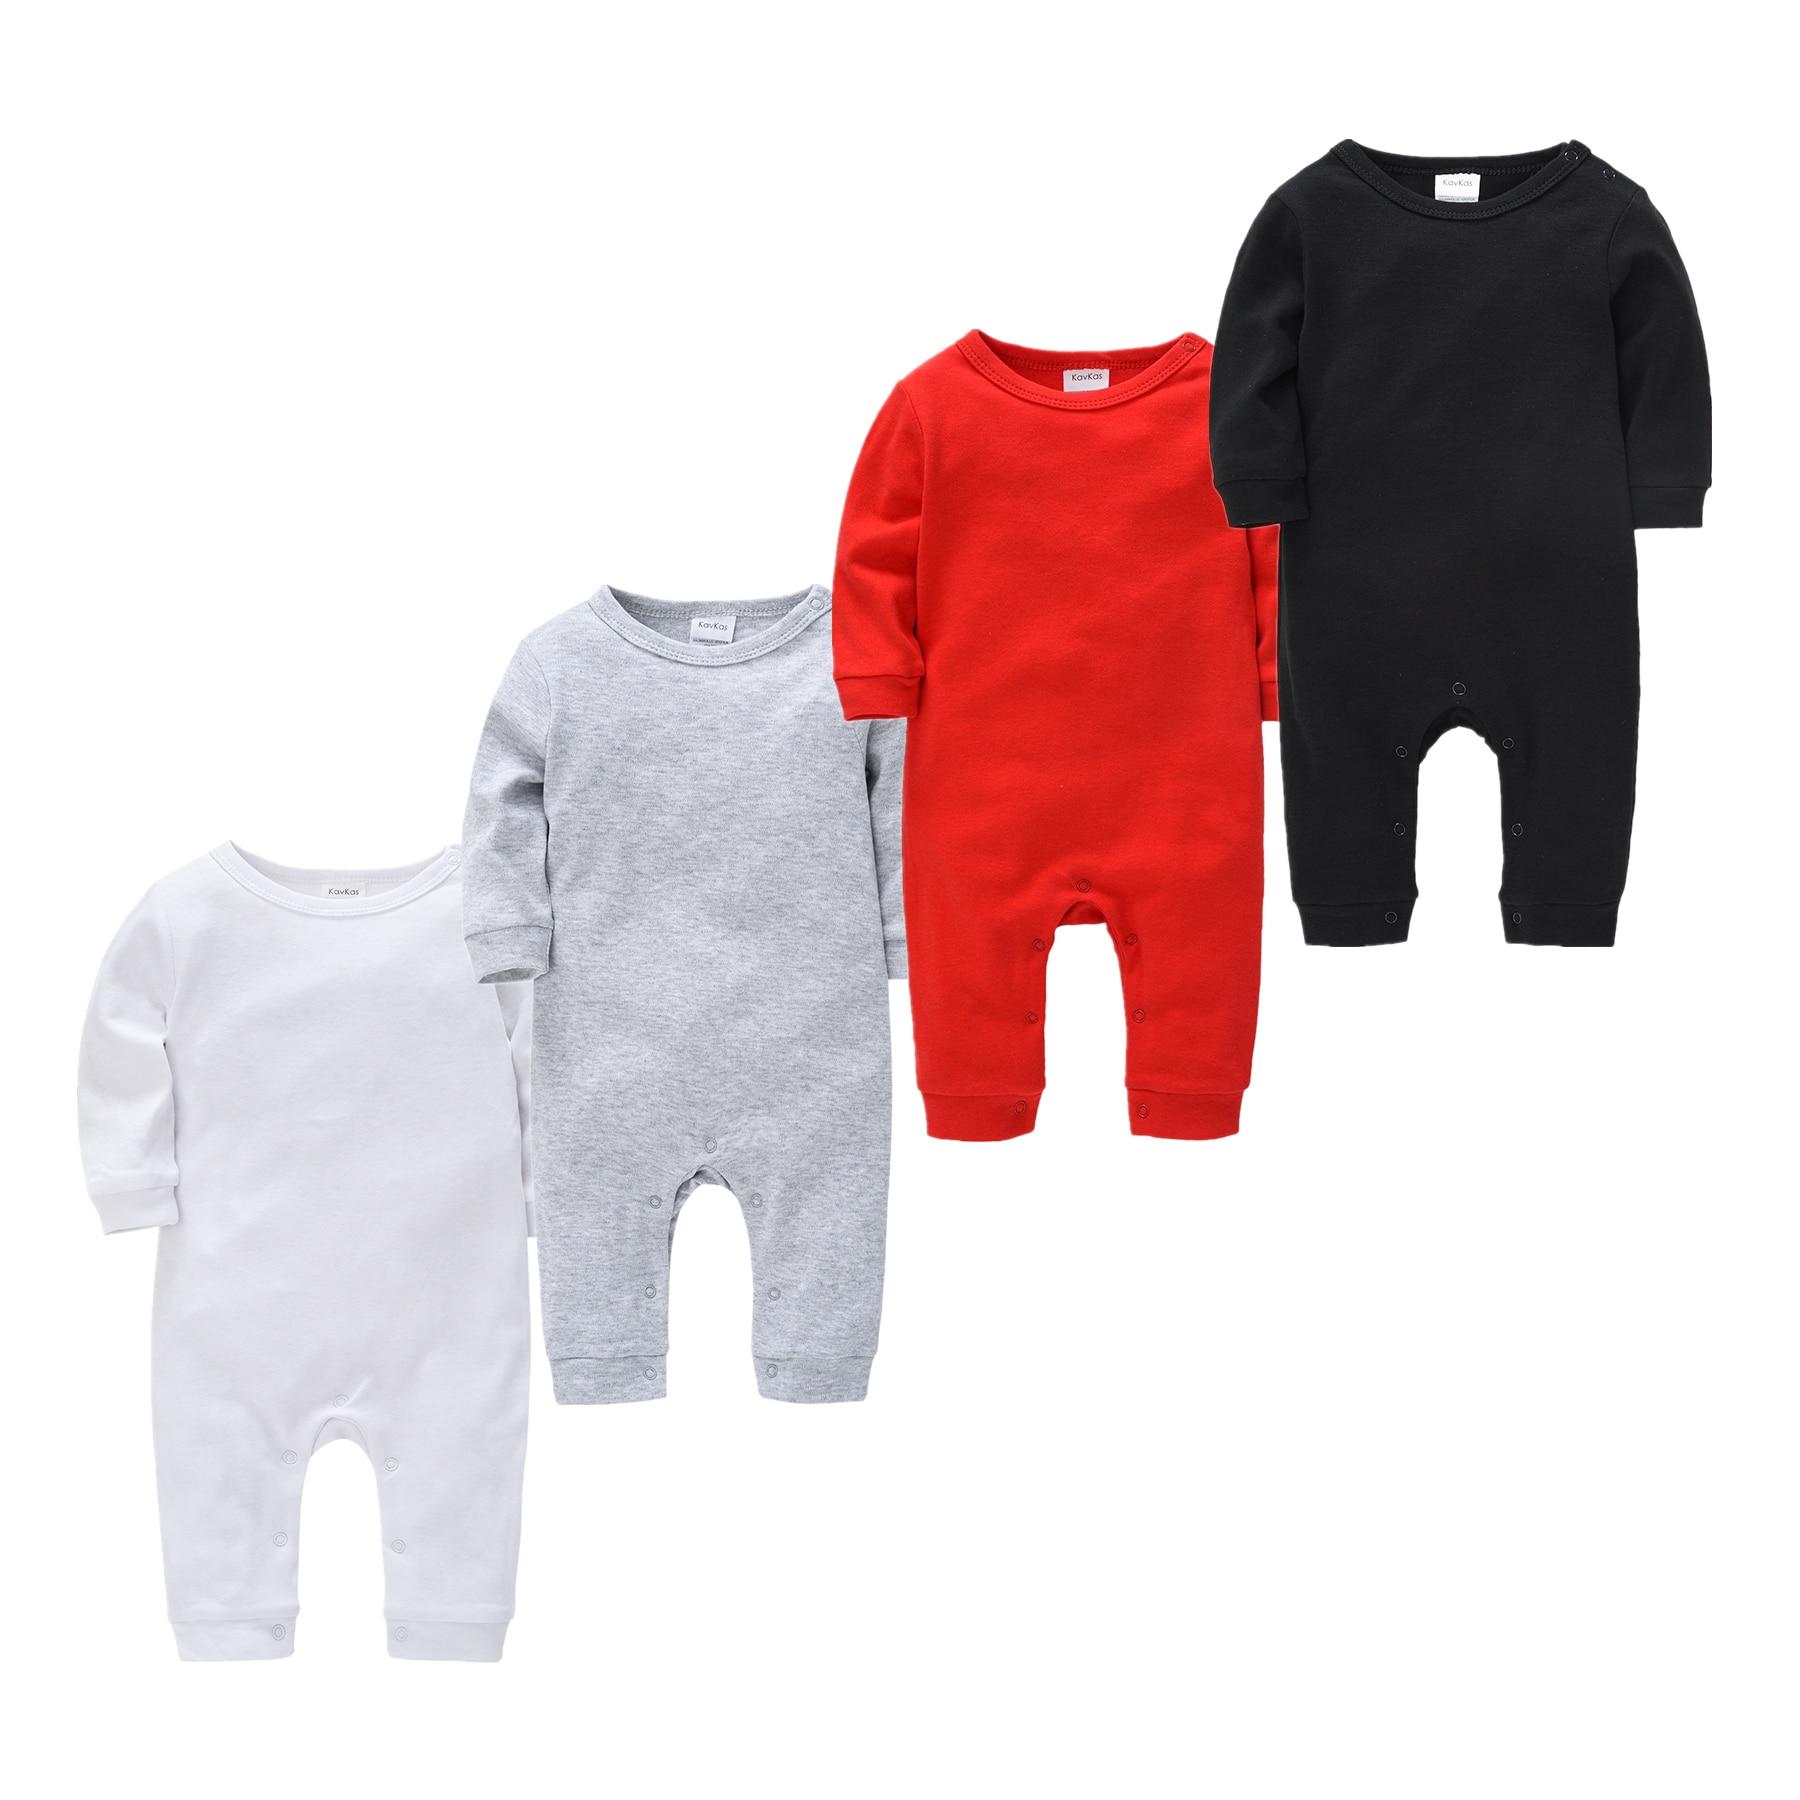 Mono para Recién Nacido 0-18M, pijamas mamelucos para niños, Blanco sólido, ropa De bebé negra, pijamas infantiles De manga larga para niños y niñas